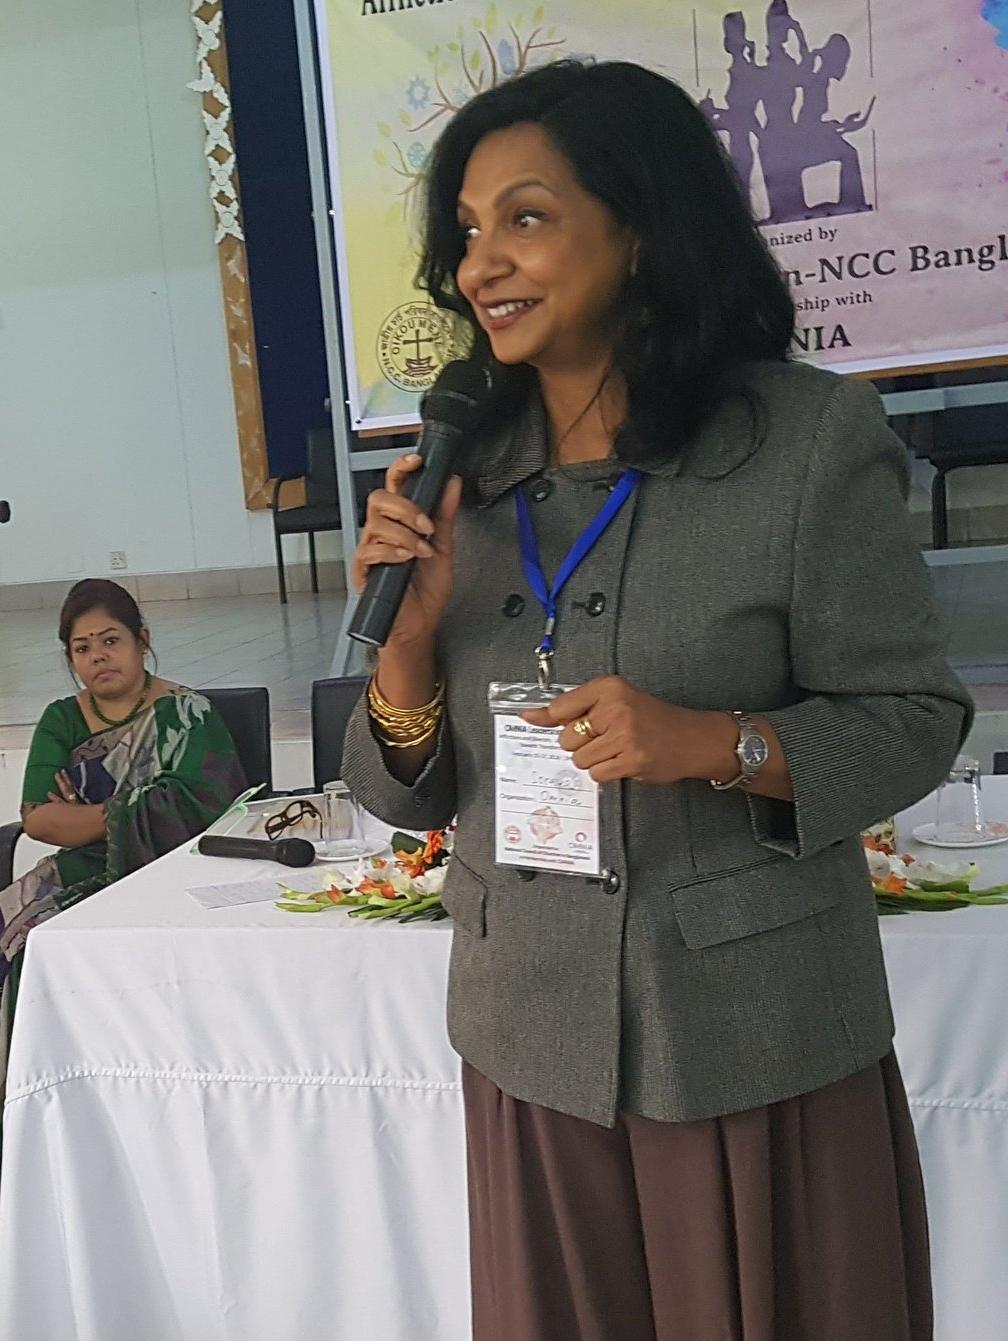 OMNIA Leader Soraya Deen addressing issues of patriarchy in Bangladesh